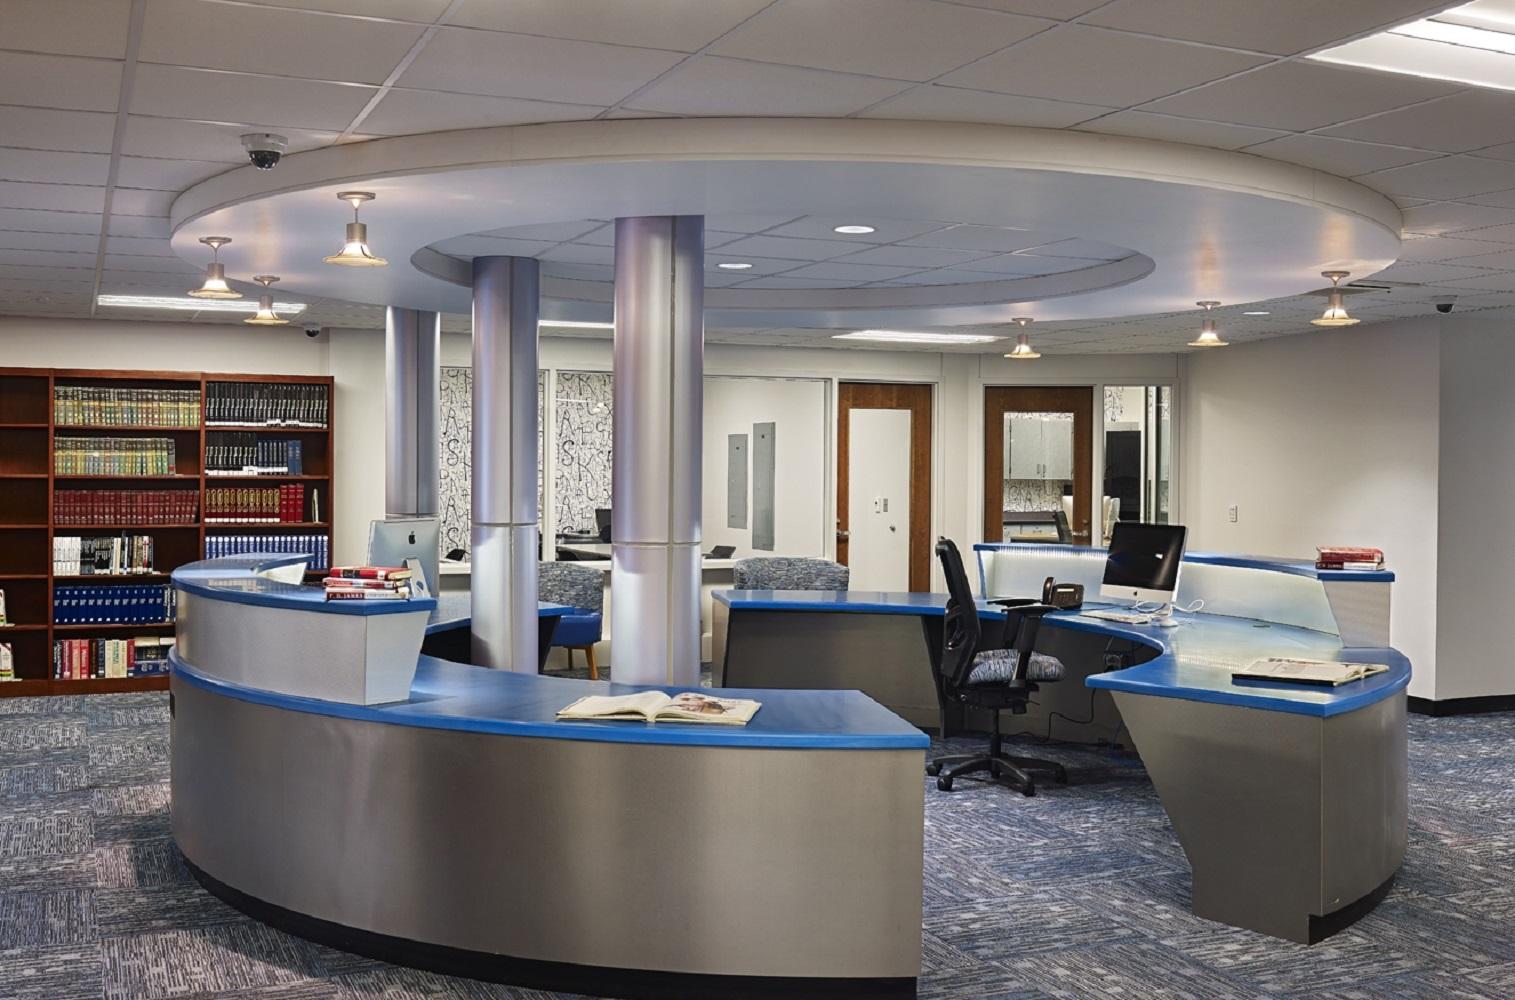 Interior - Center Desk Focus.jpg